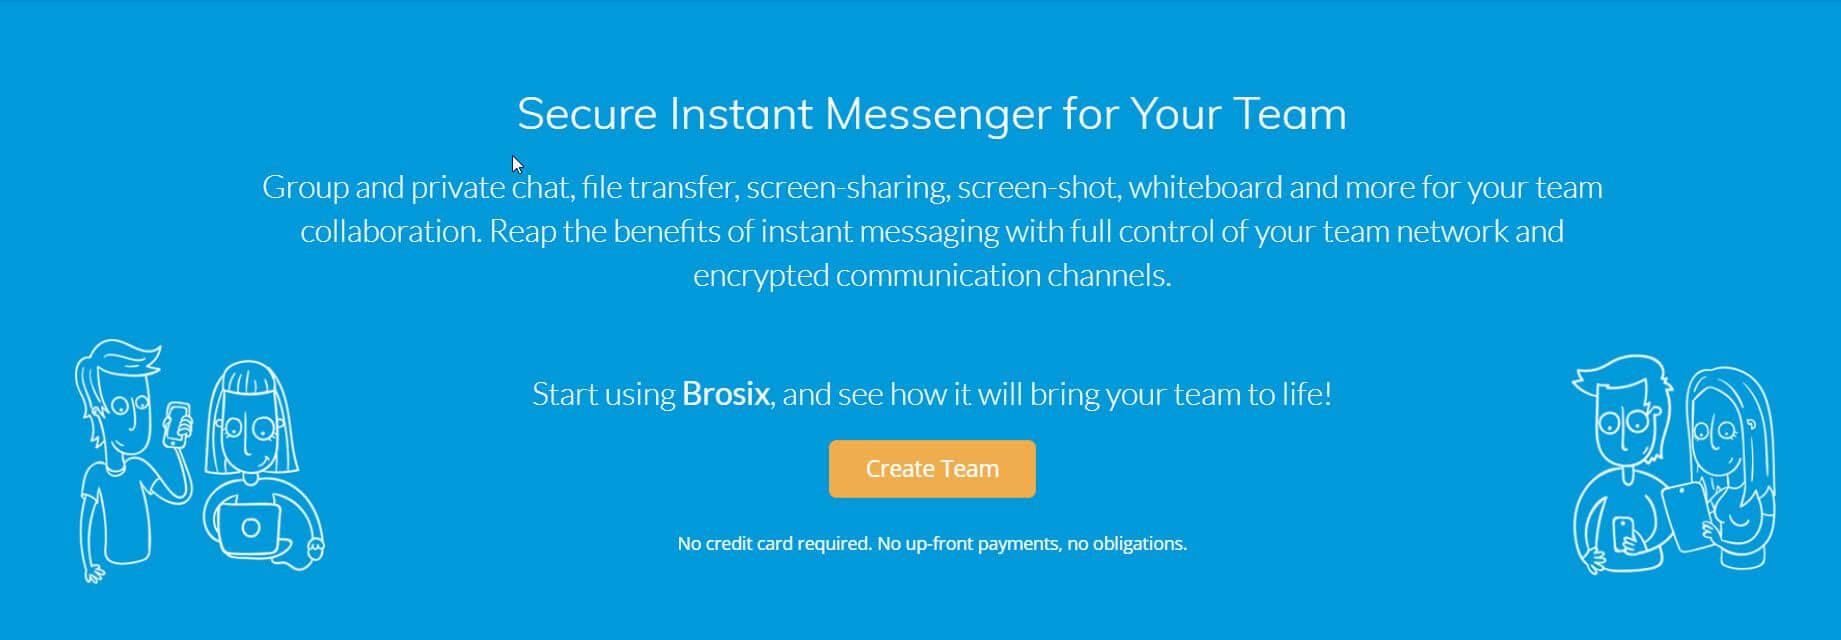 Brosix homepage